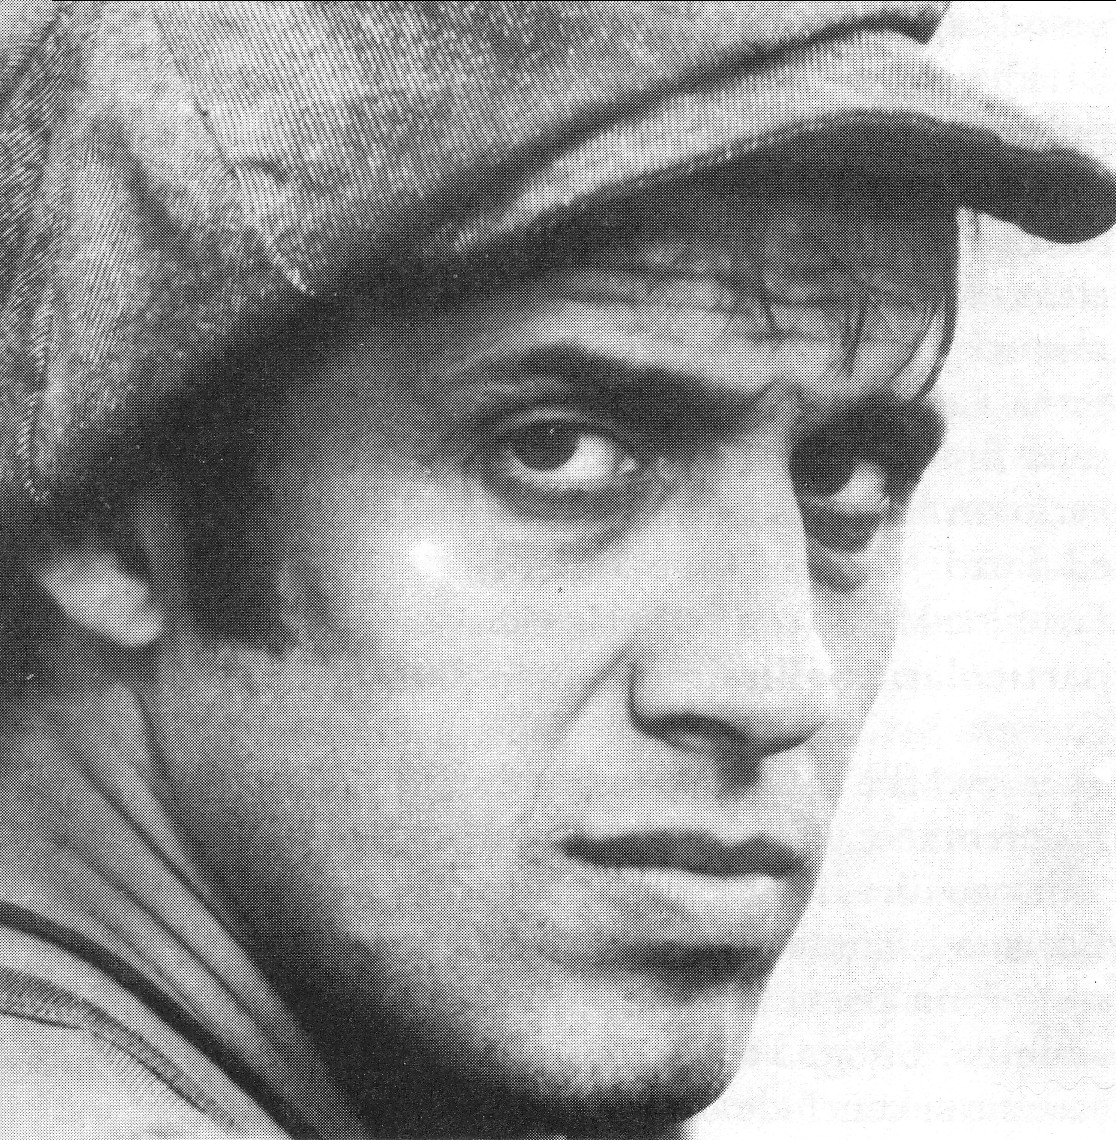 Adriano Celentano Net Worth